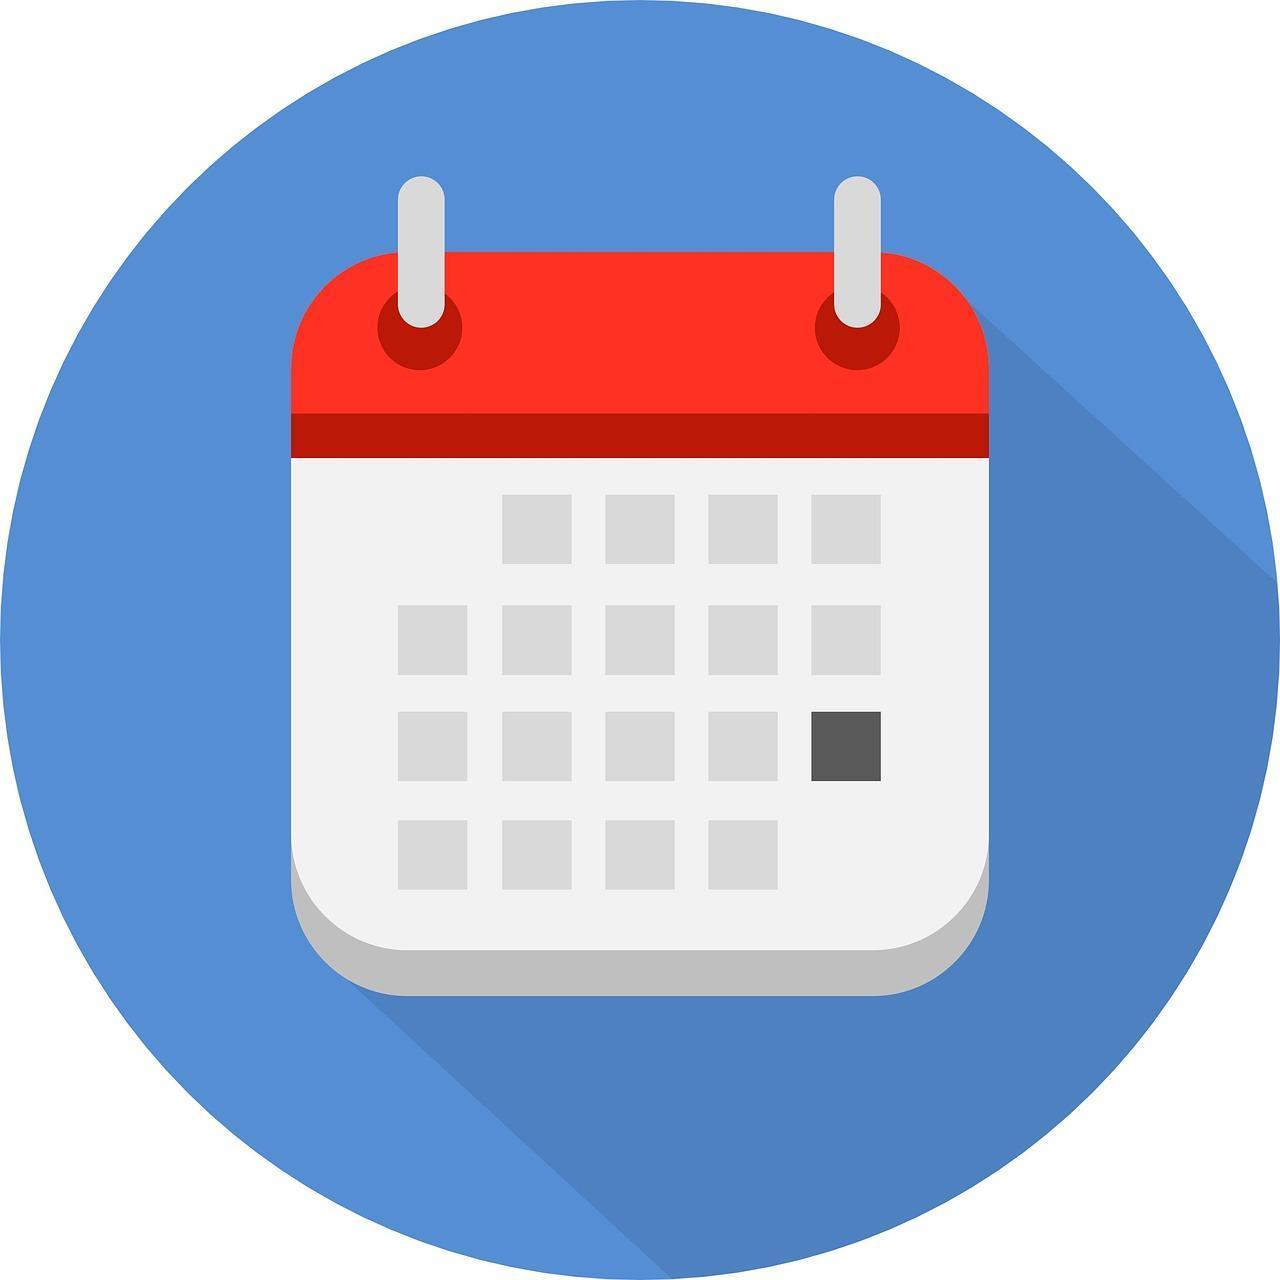 Image of calendar icon